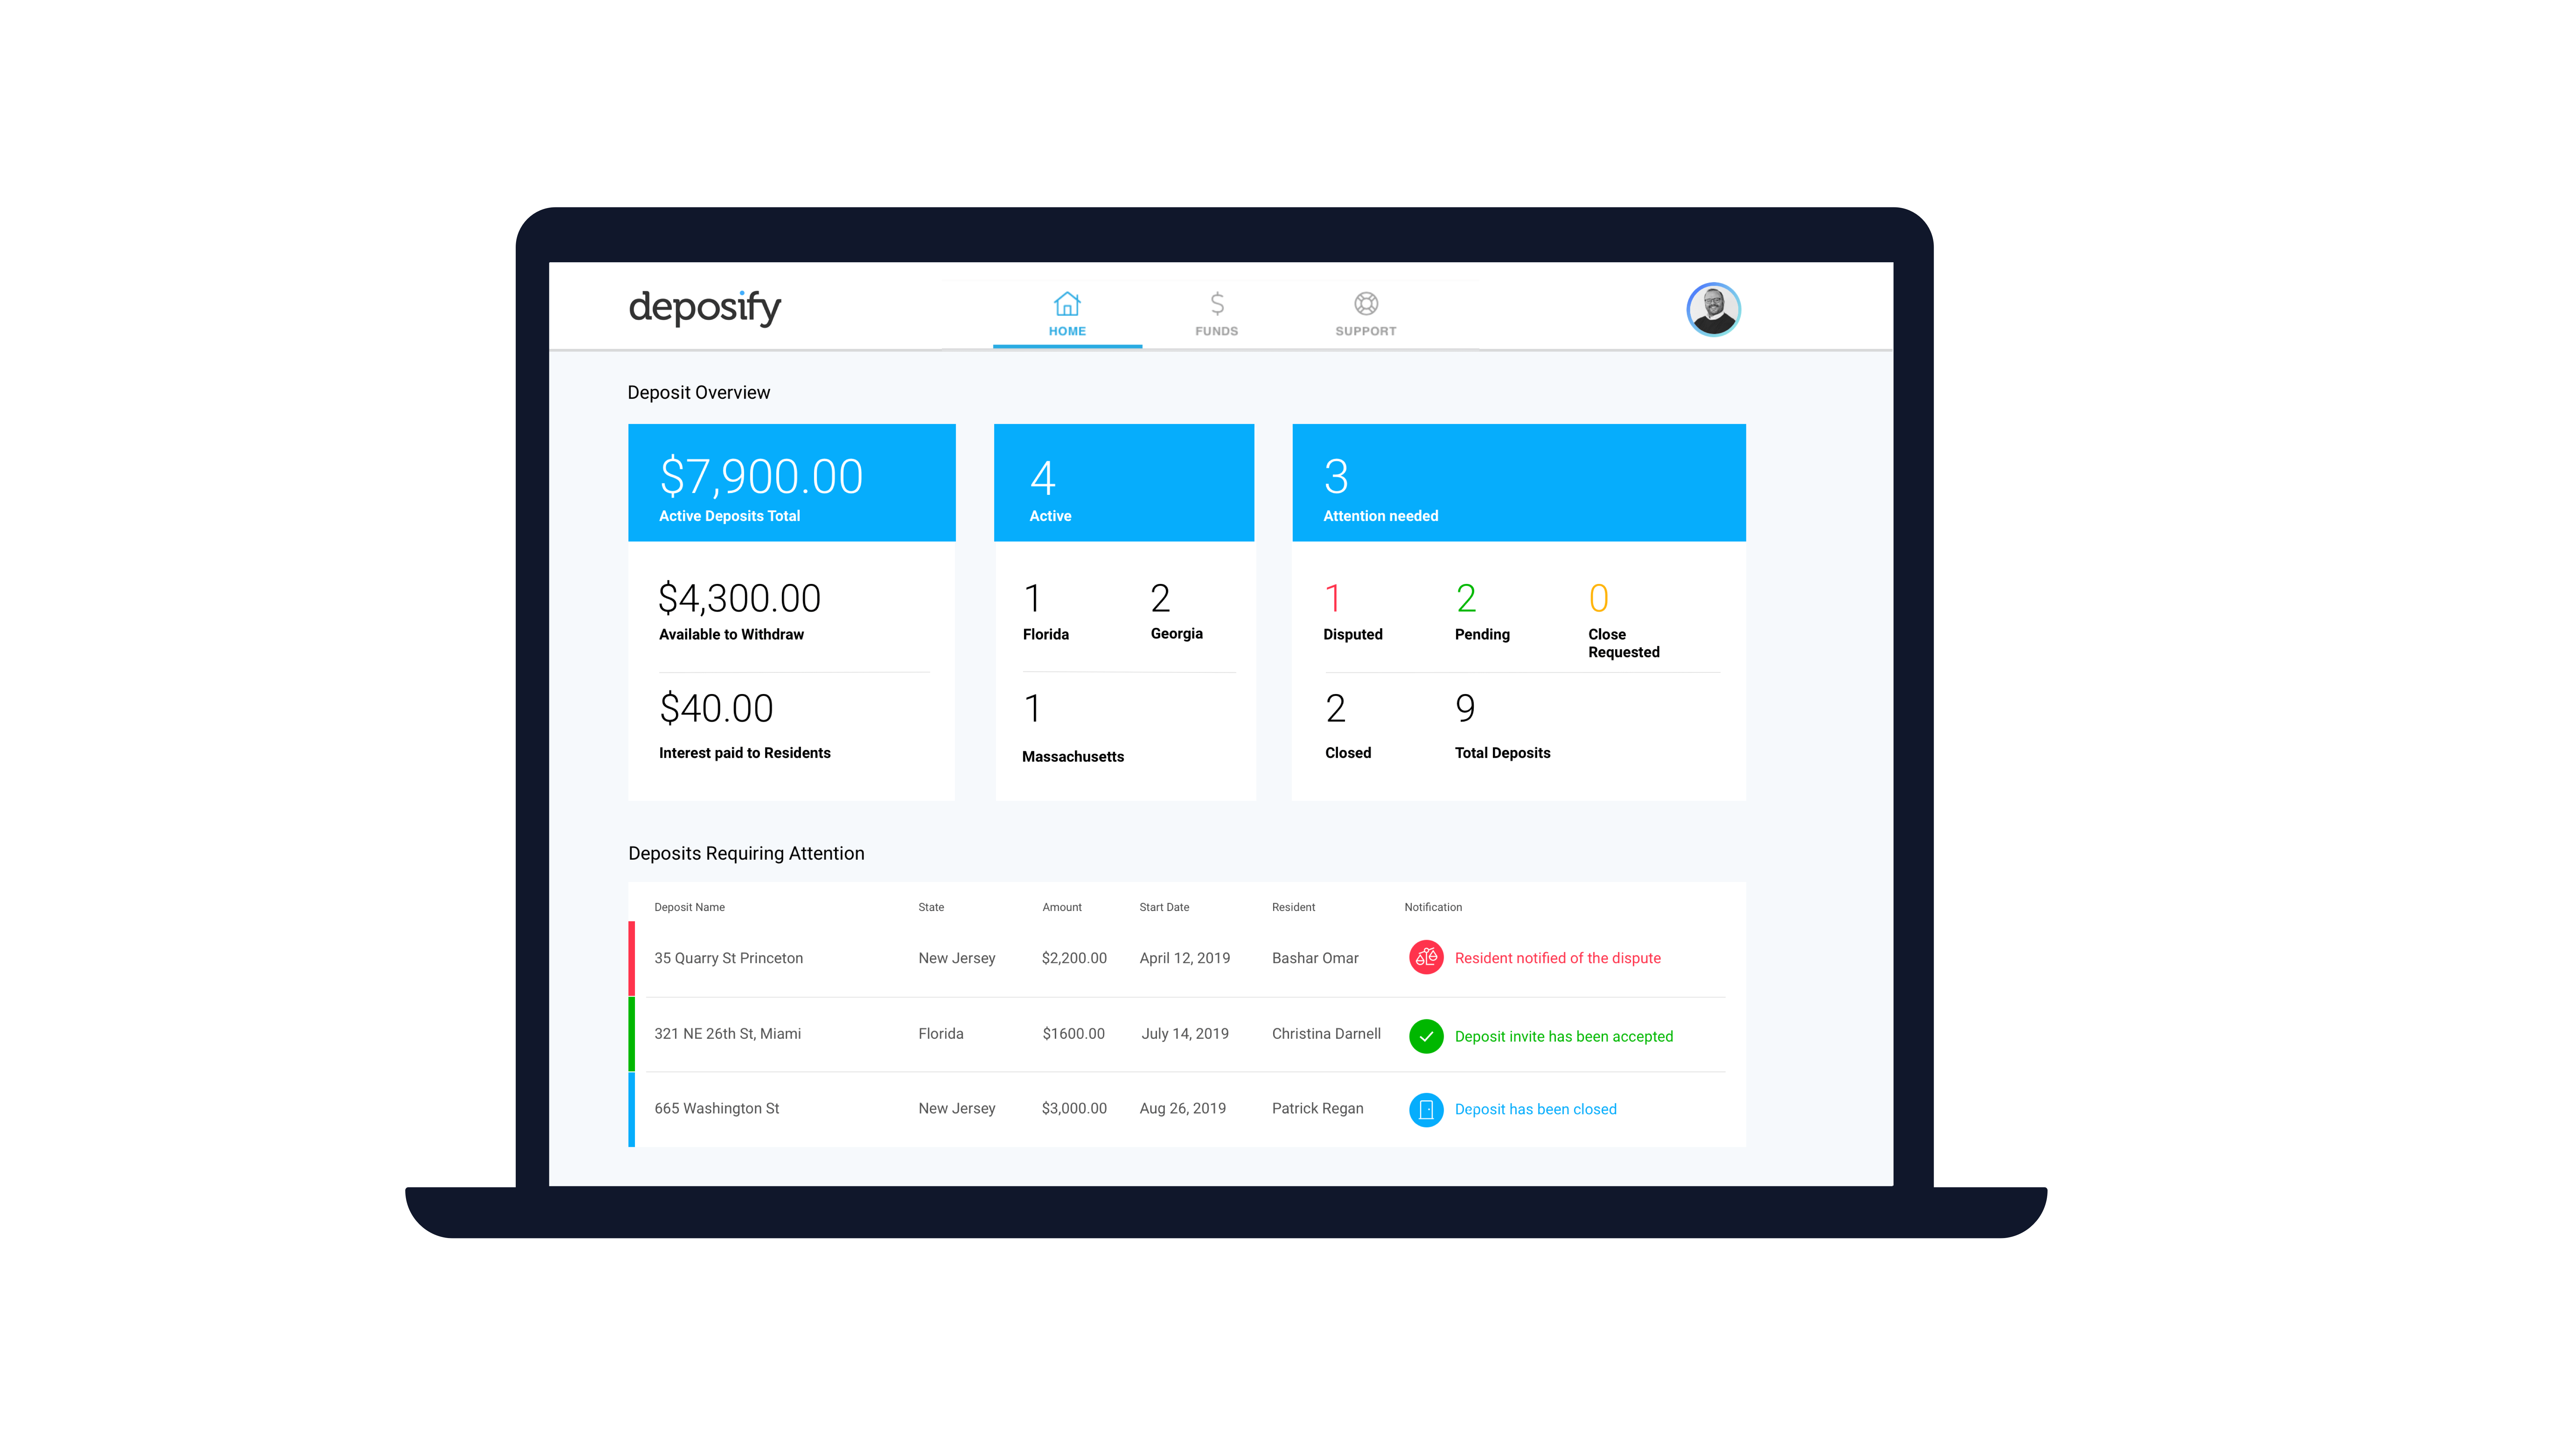 deposify dashboard on a laptop screen